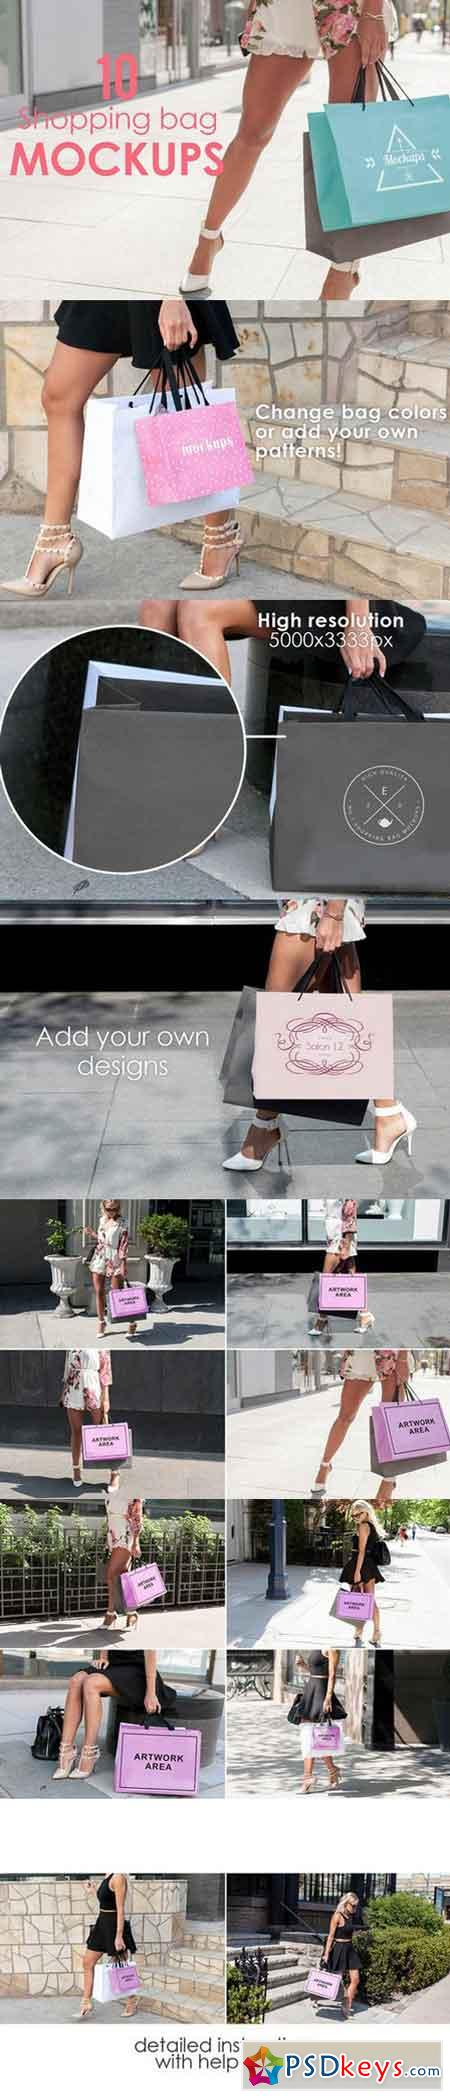 10 Shopping Bag Mockups 668819